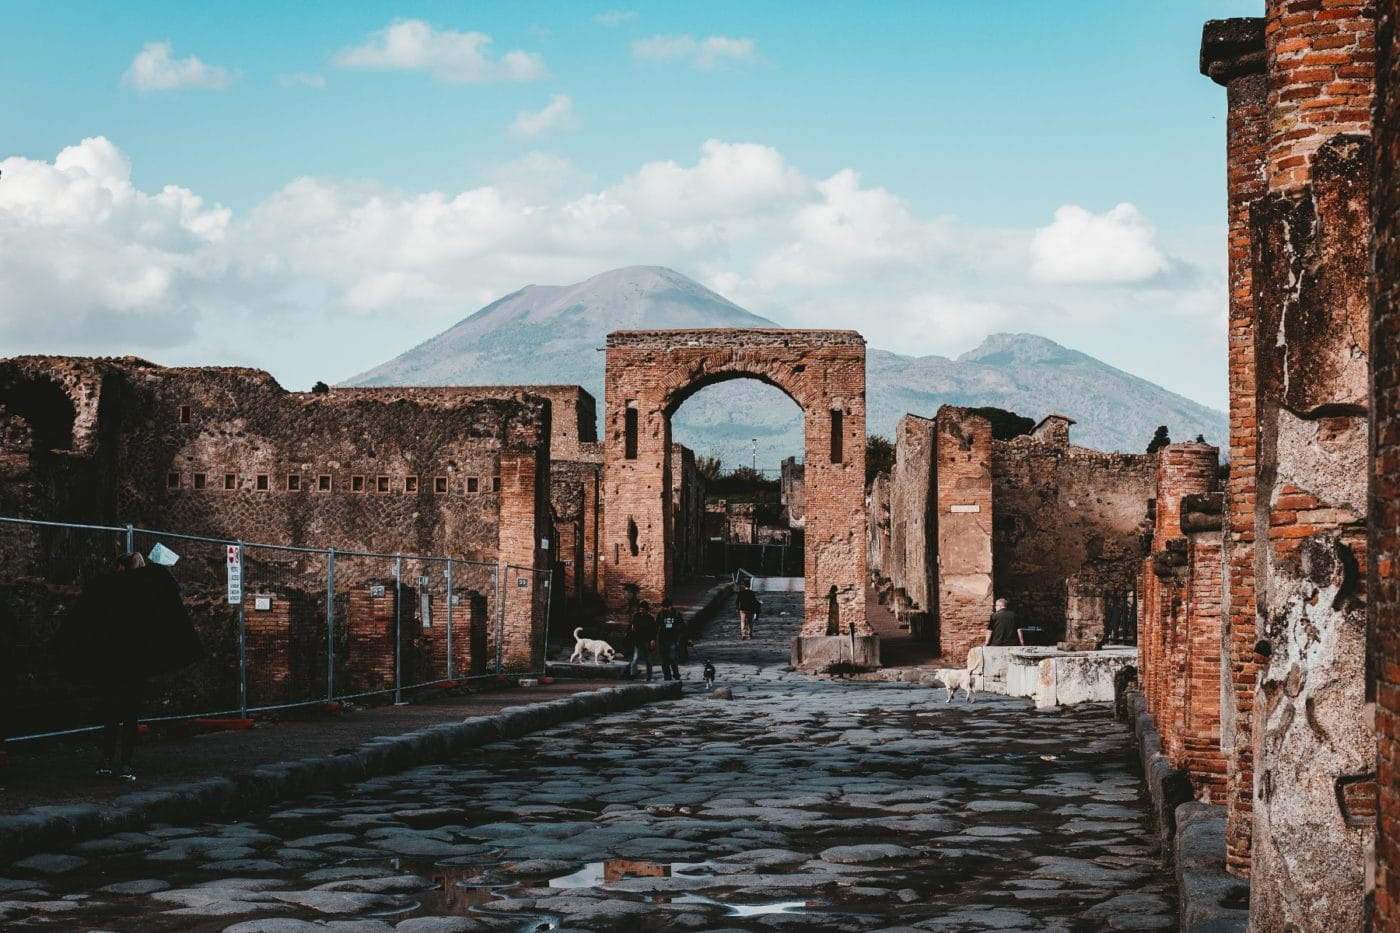 Postcard from Italy: Pompeii Archeological Park